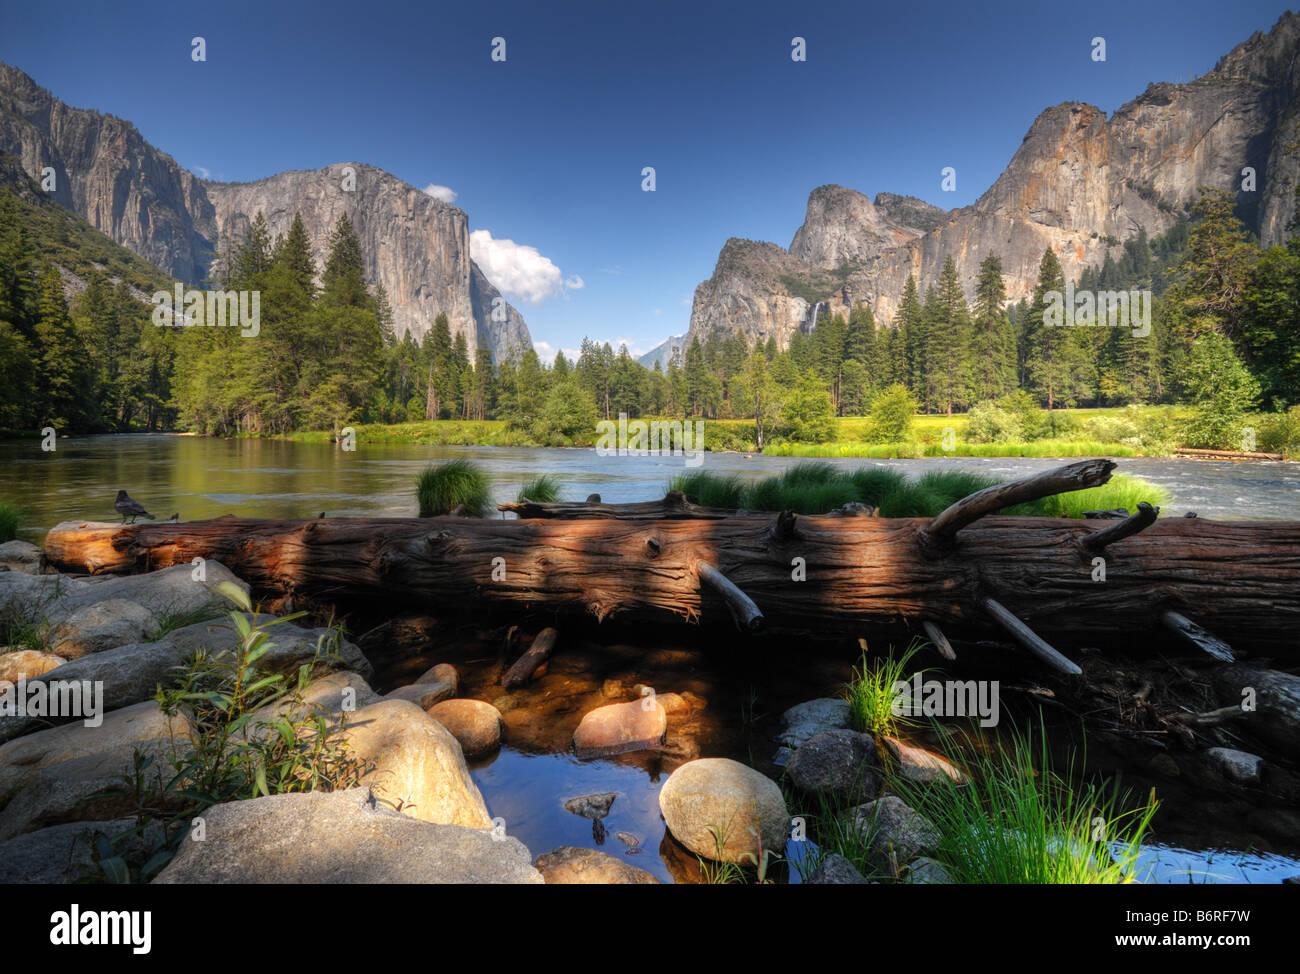 The Fallen tree of Yosemite Valley Stock Photo